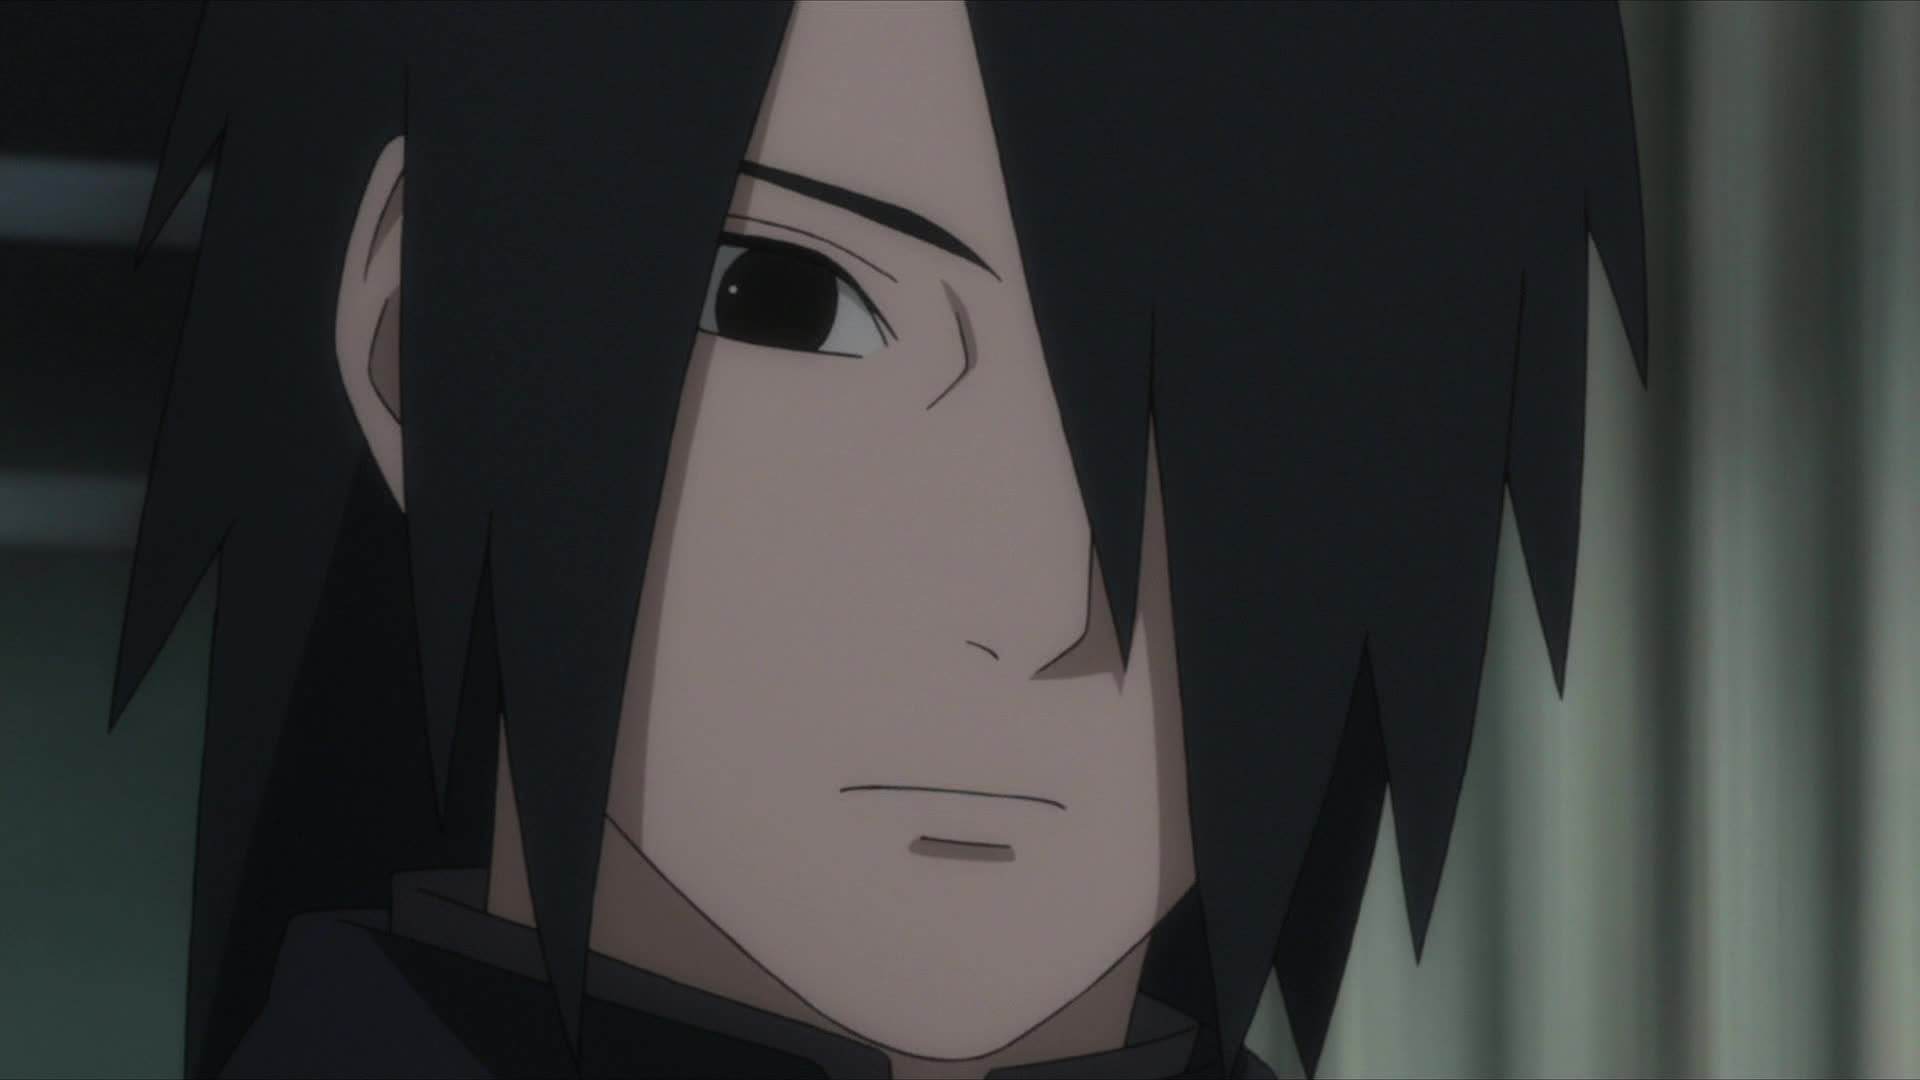 BORUTO: NARUTO NEXT GENERATIONS Episode 63, Sasuke's Secret